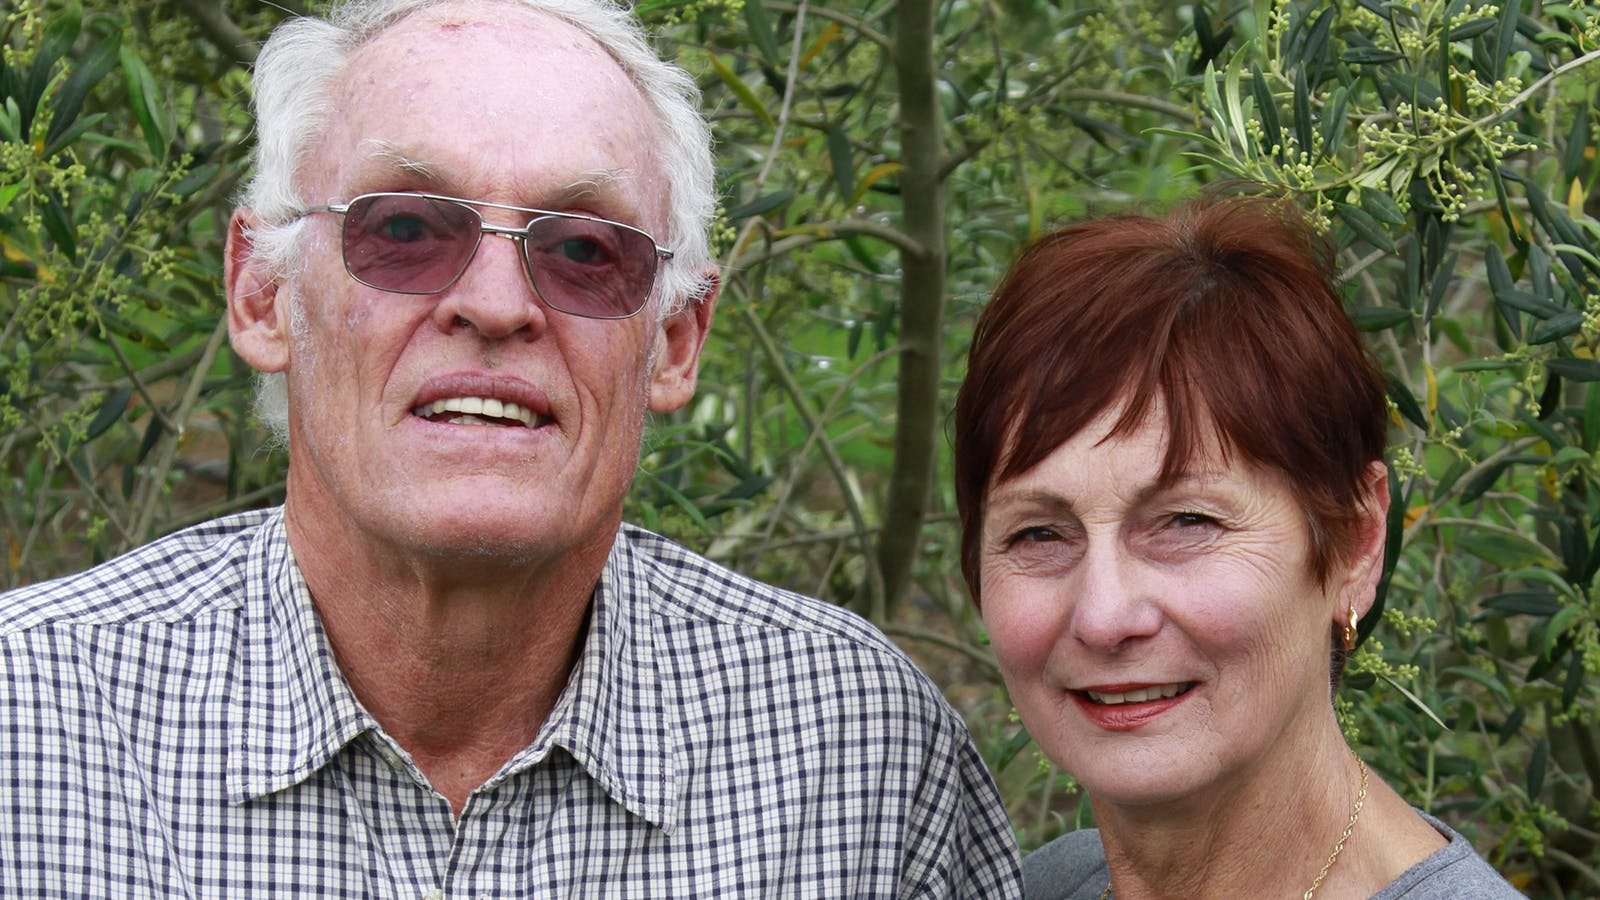 Len and Renate kint